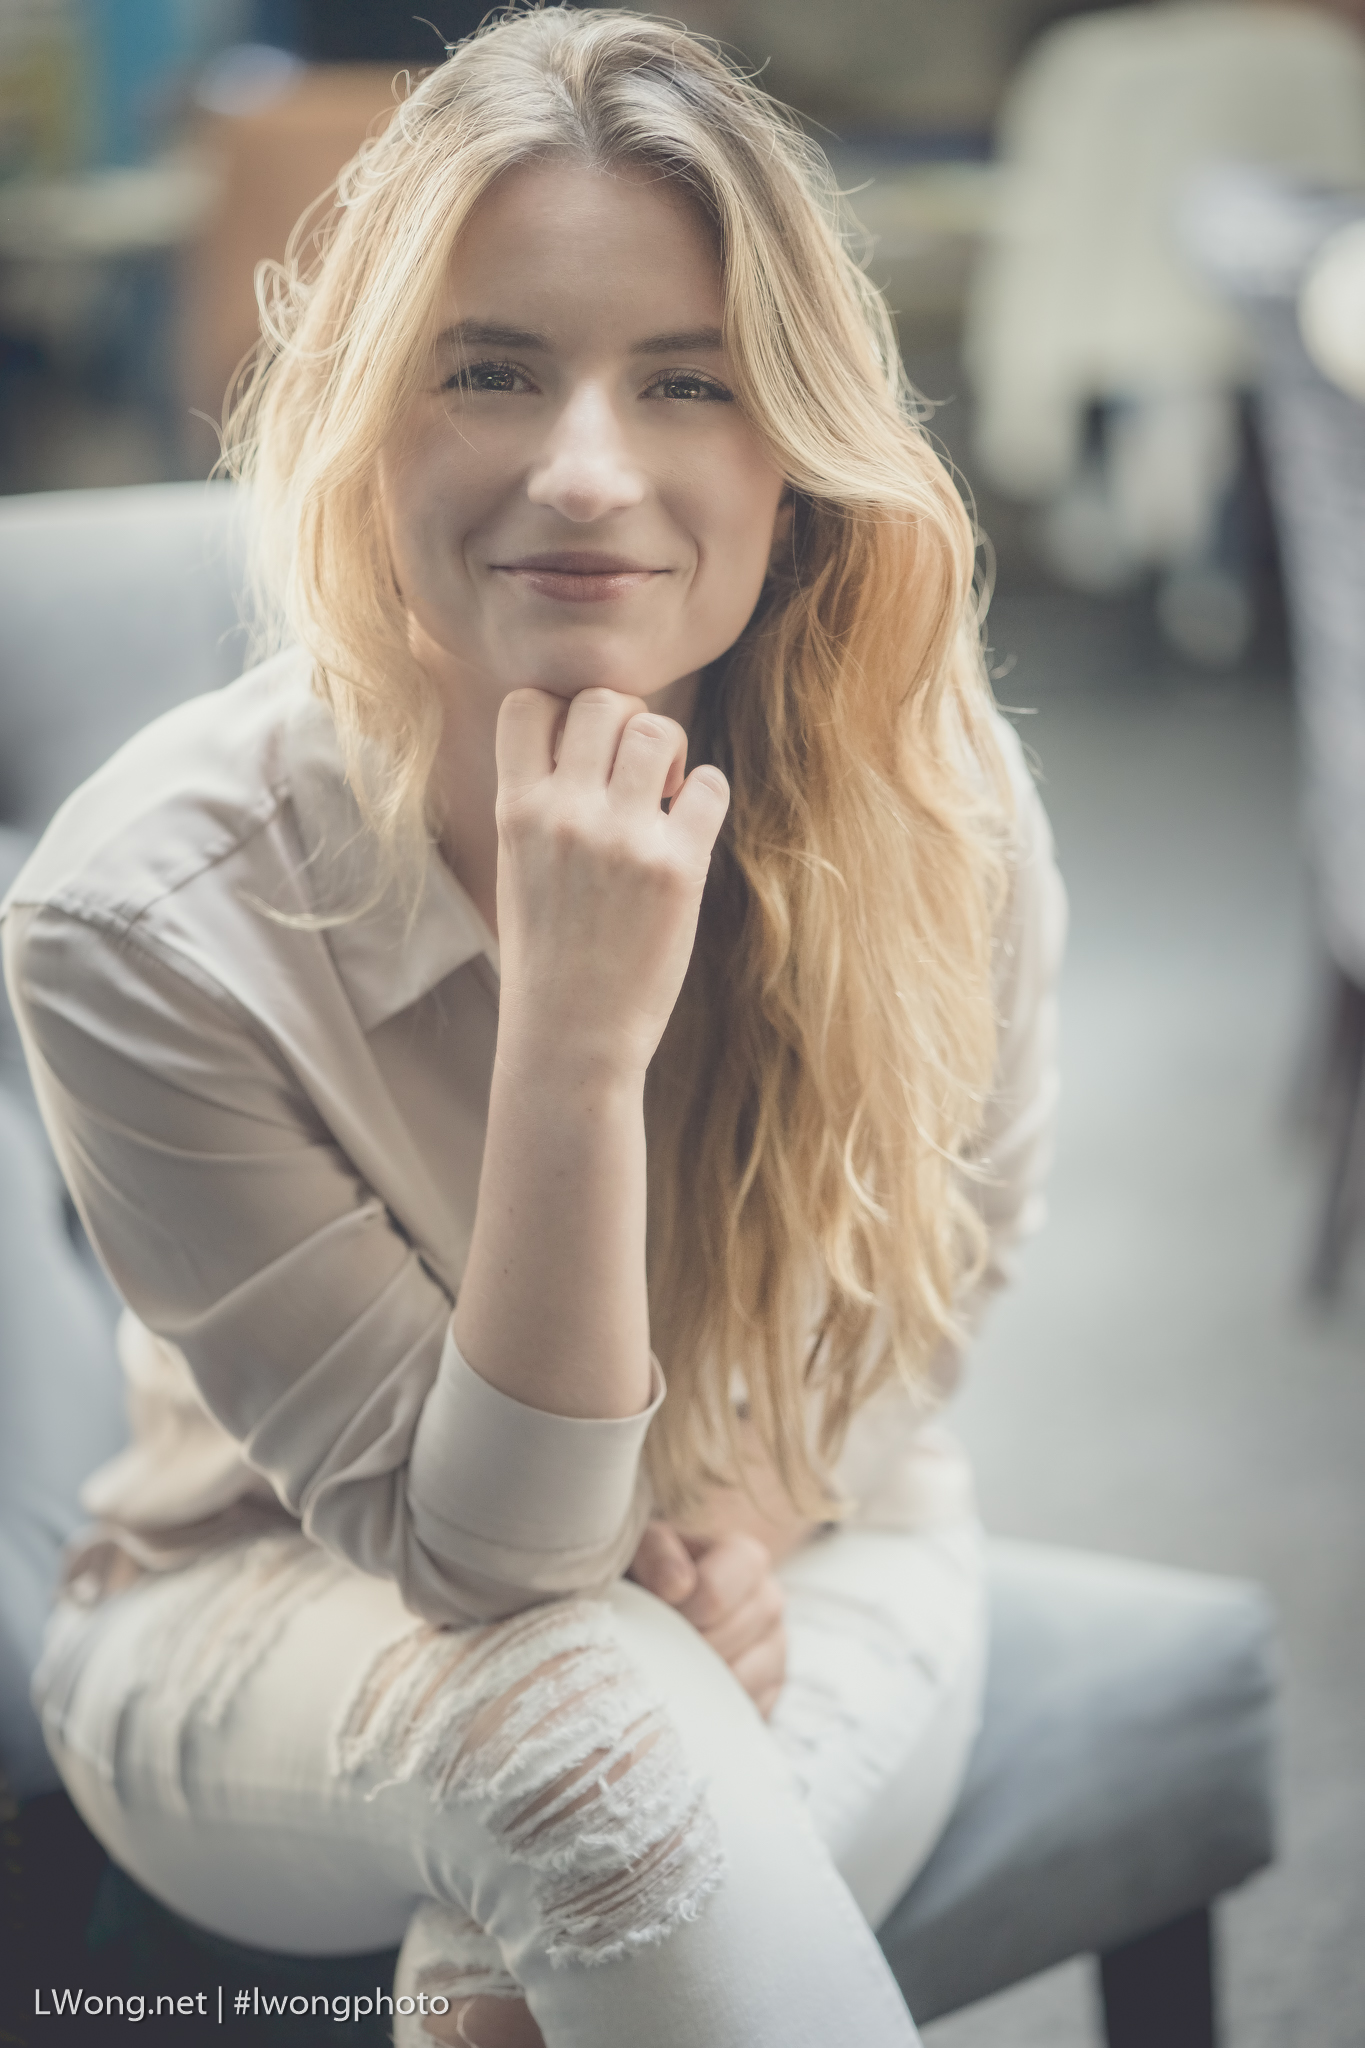 Daria_Rebenok_Co-founder_CEO_Grabr